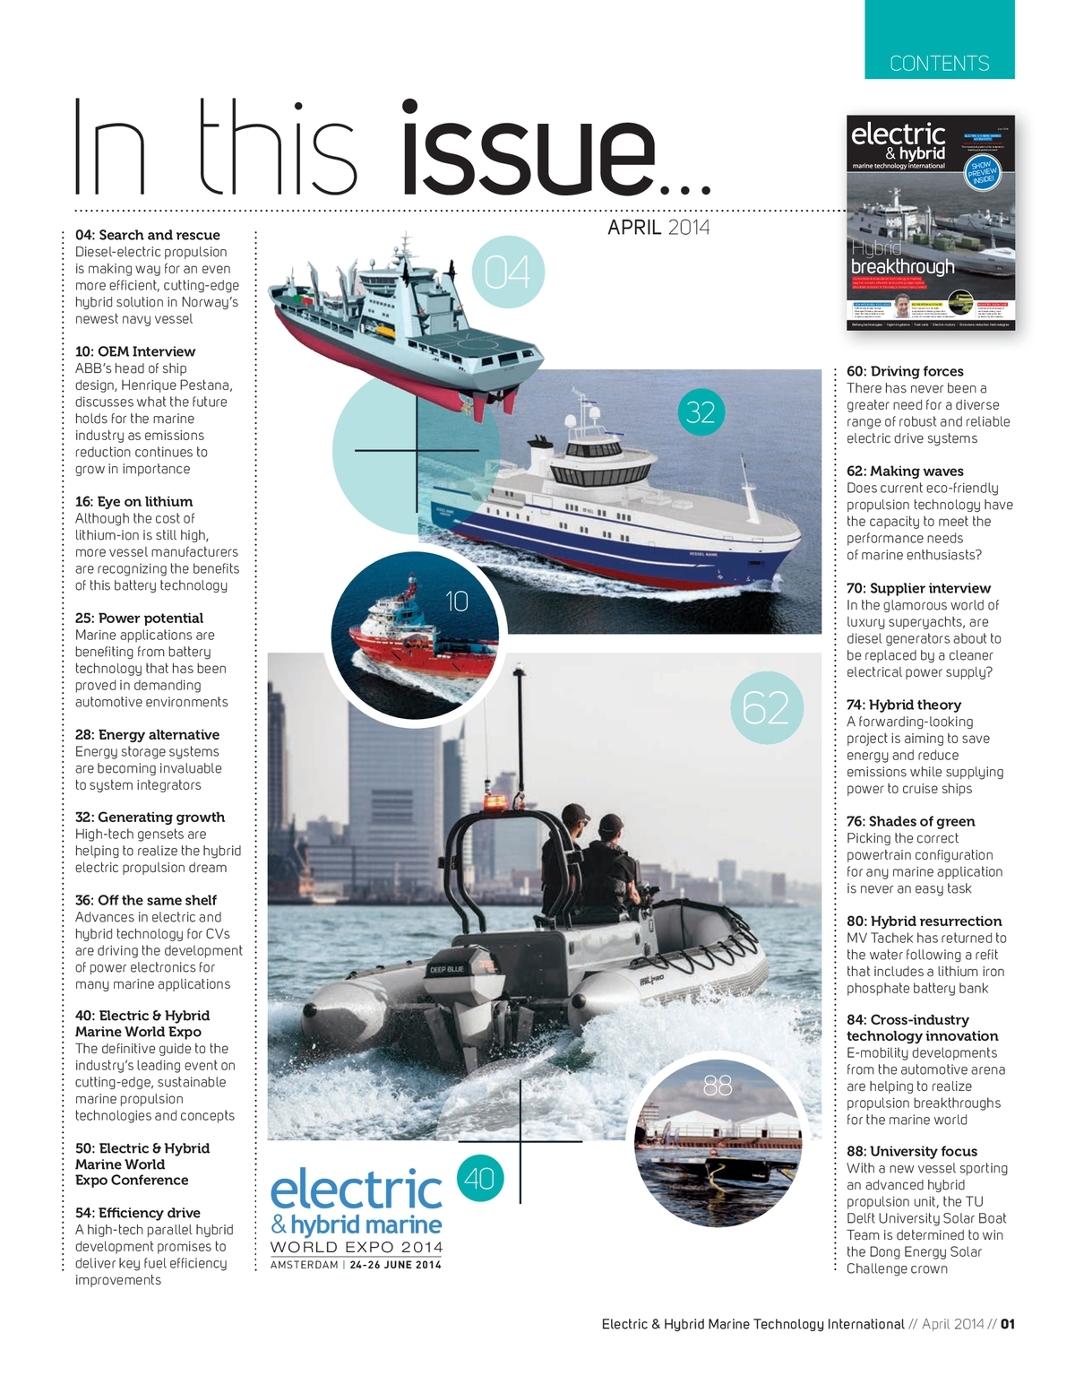 April 2014 Electric & Hybrid Marine Technology International